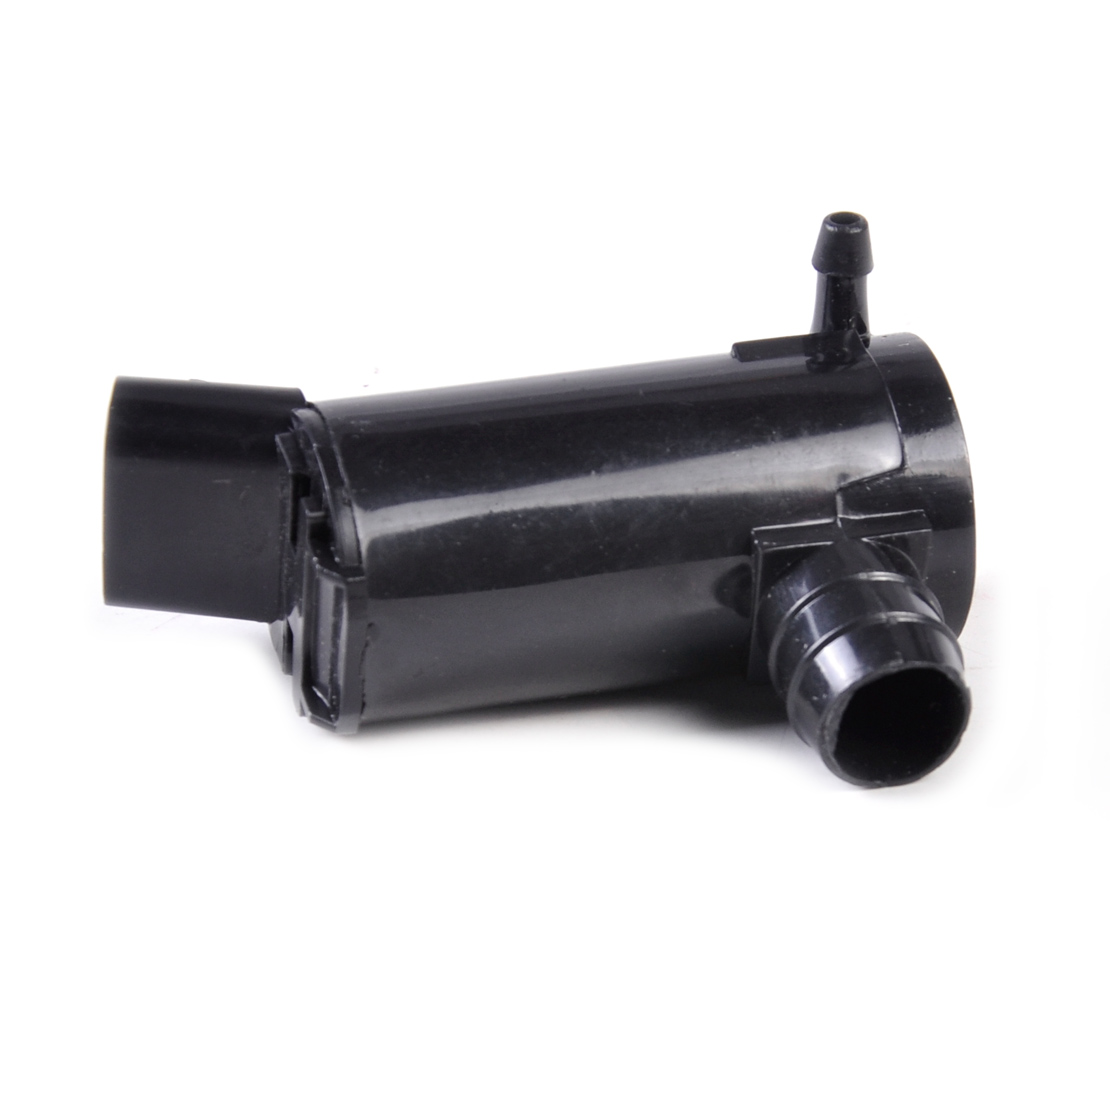 CITALL Windshield Washer Pump Motor 85330-12340 85330AA010 85310-20190 Fit for Toyota Camry Corolla Sienna Solara Echo